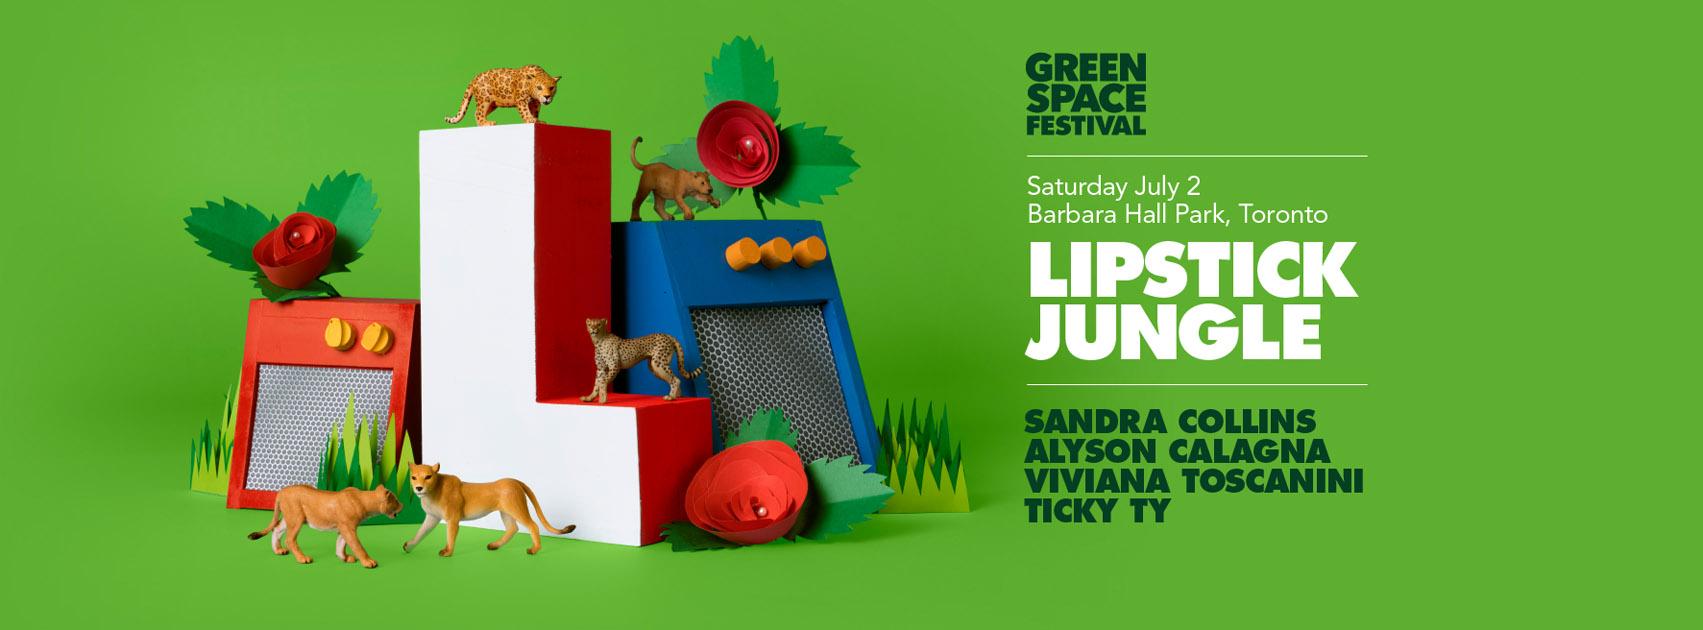 greenspace2016-06